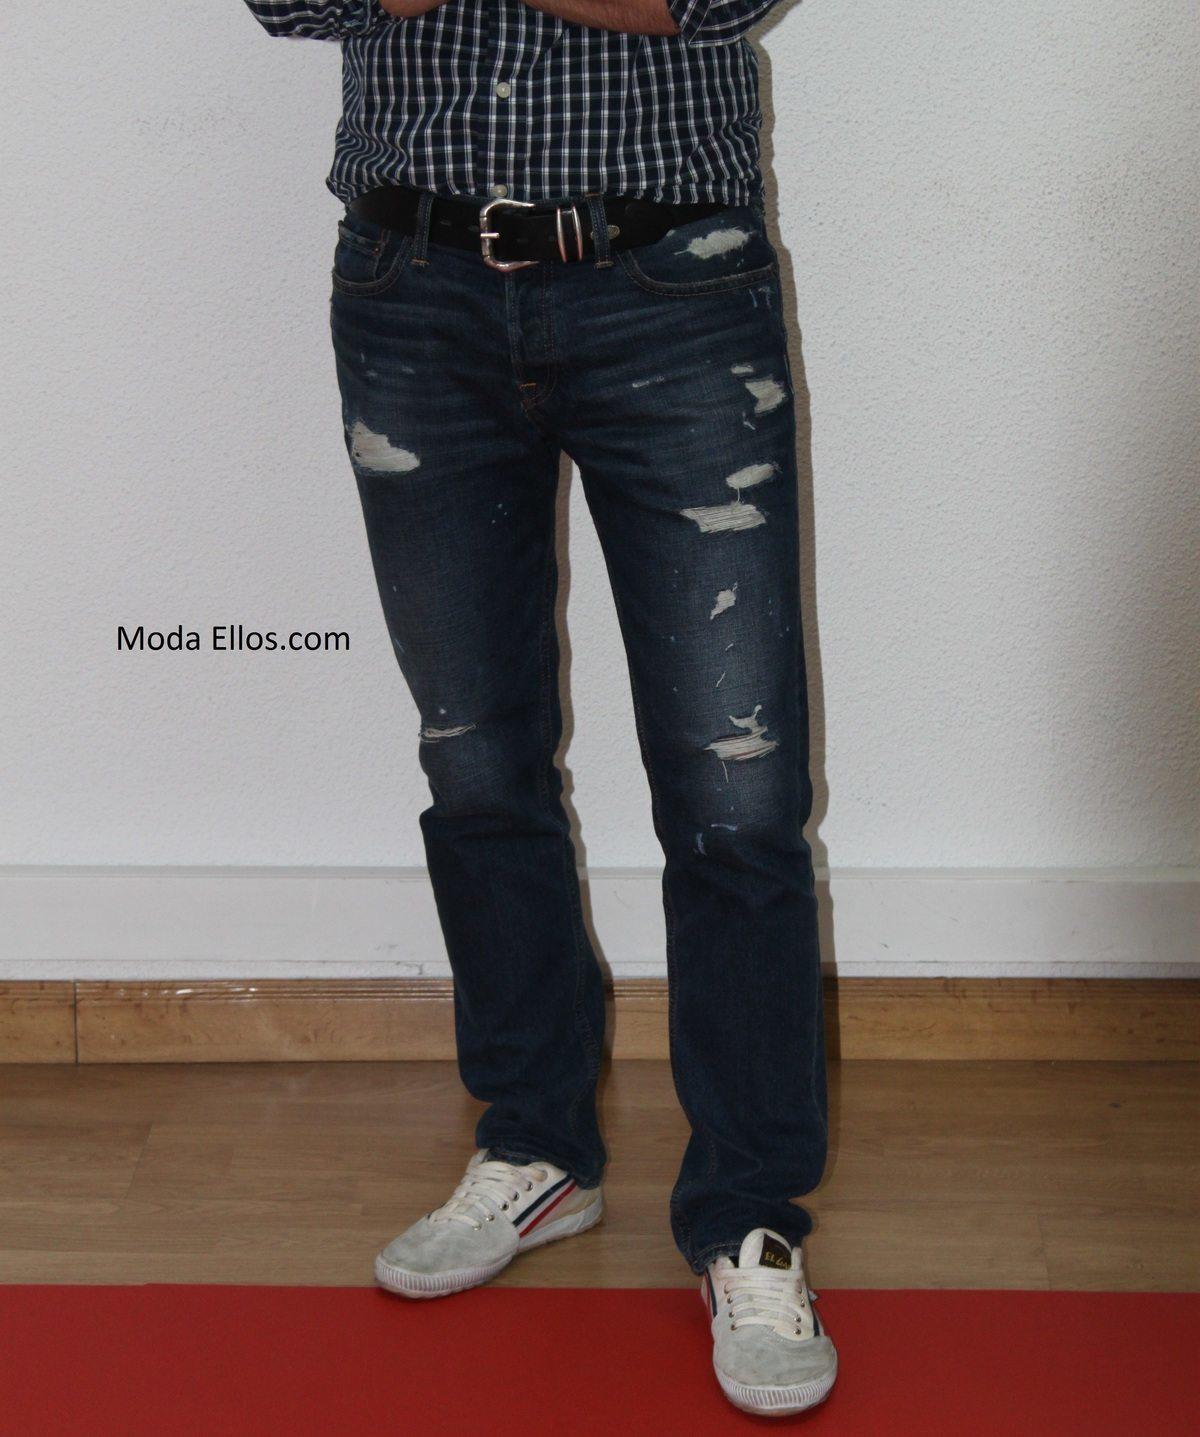 pantalones-holliser-2013-parte-delanera